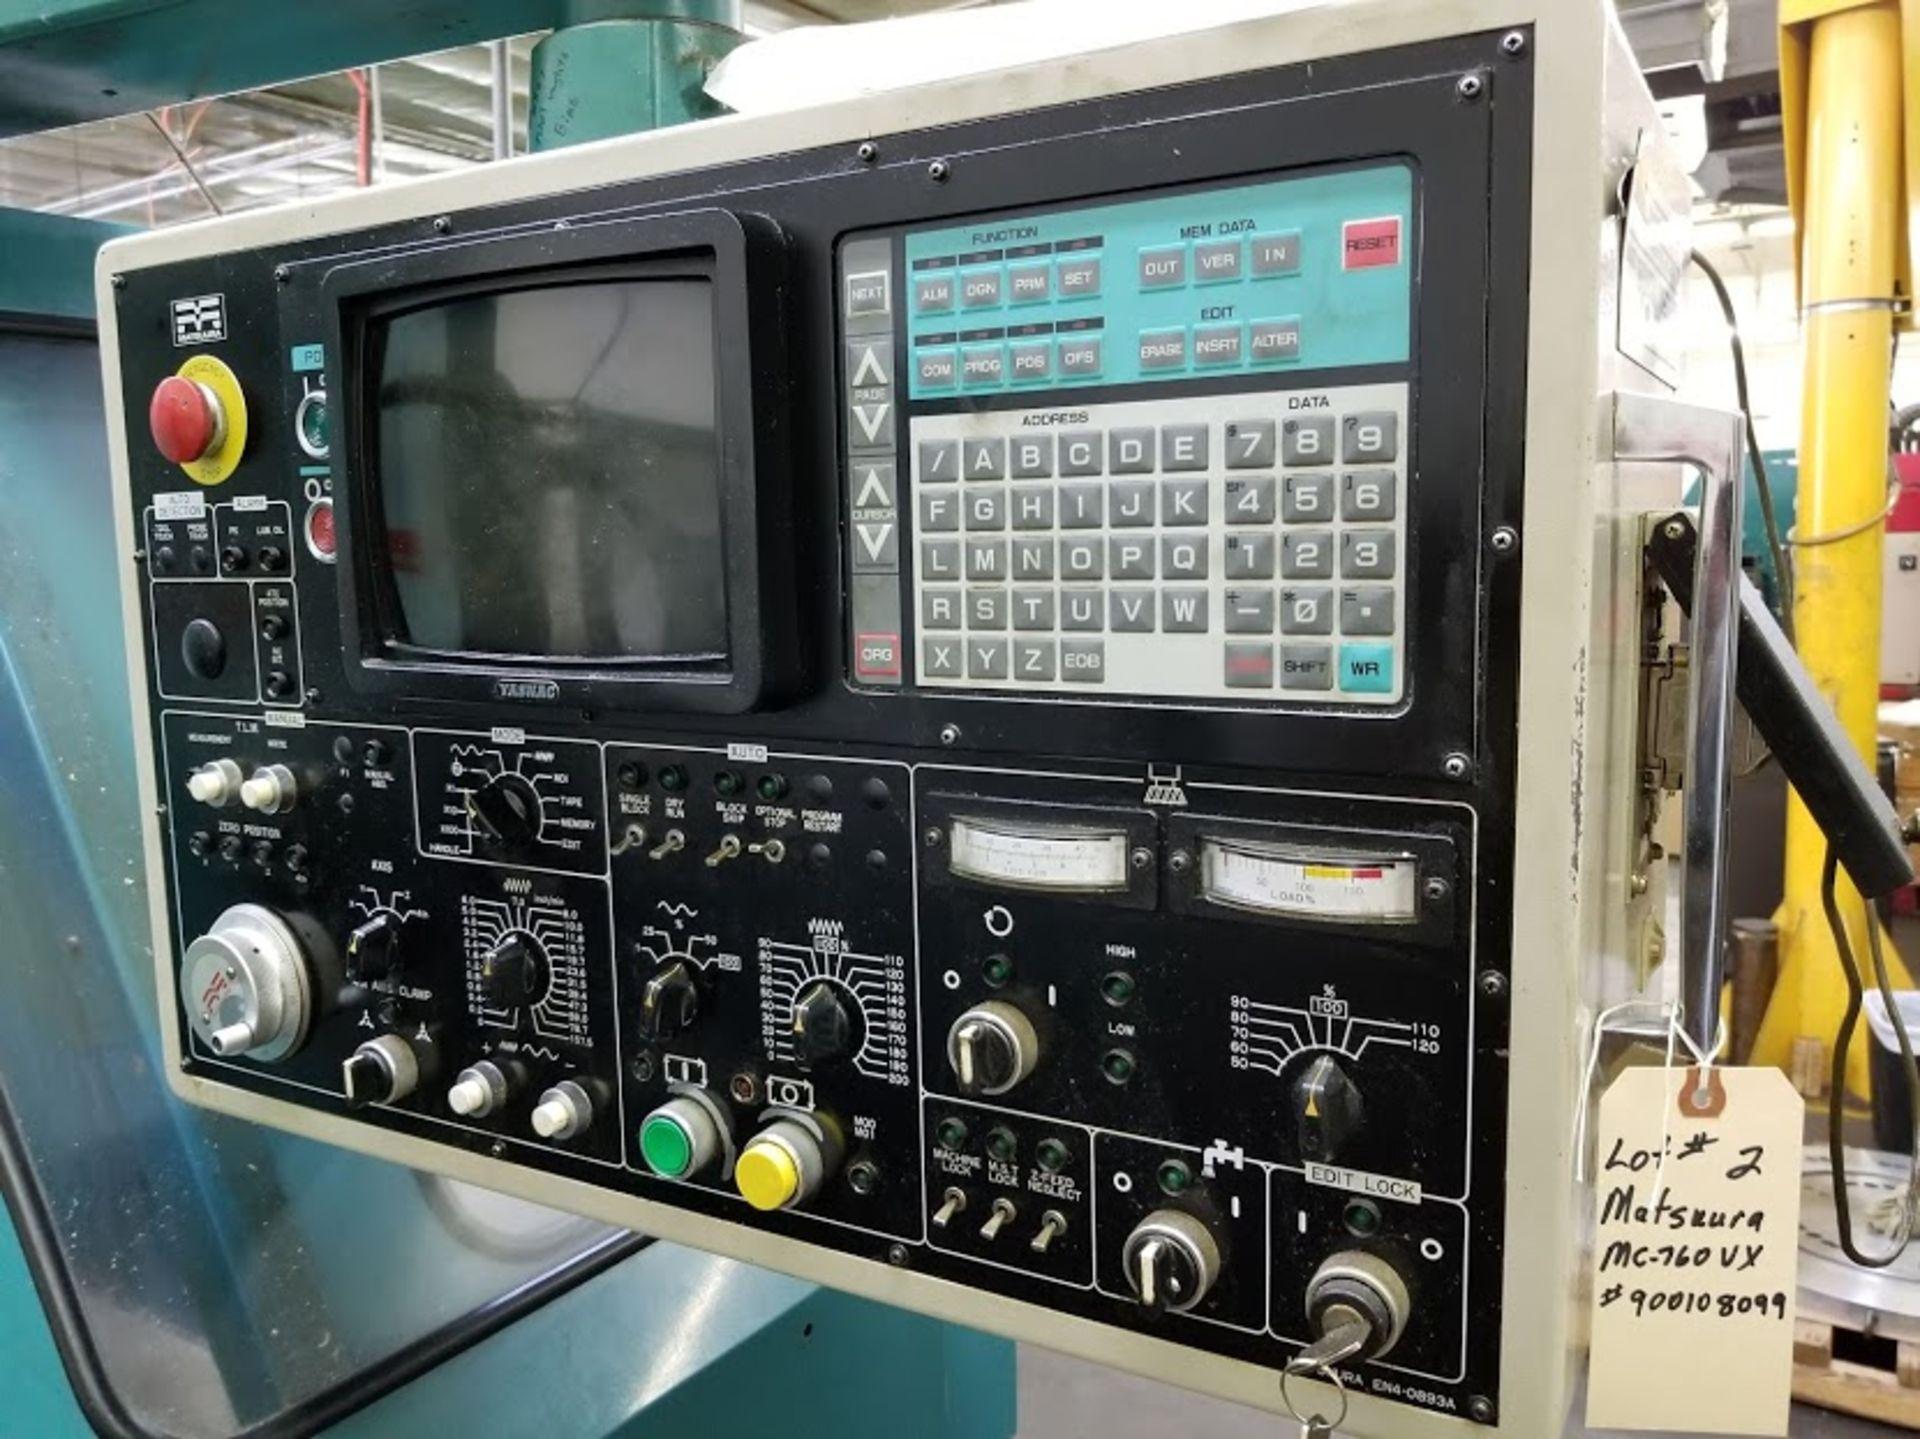 Lot 2 - Matsuura MC-760 VX CNC Vertical Machining Center - YASNAC Controls